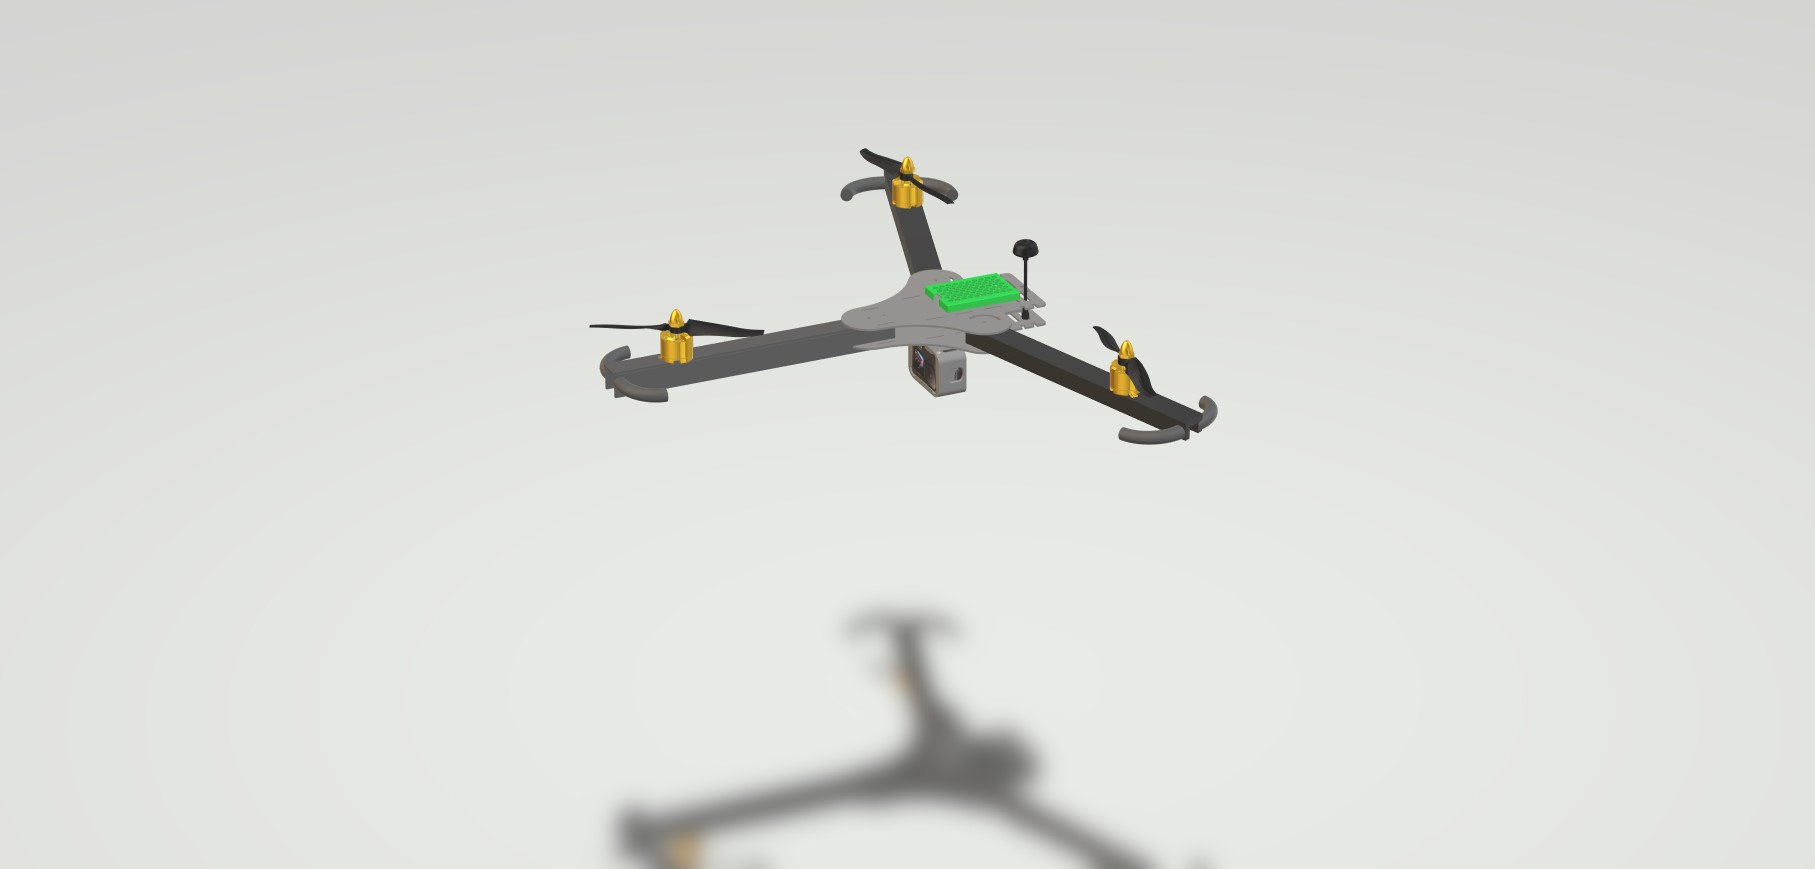 nevon selfie drone tricopter